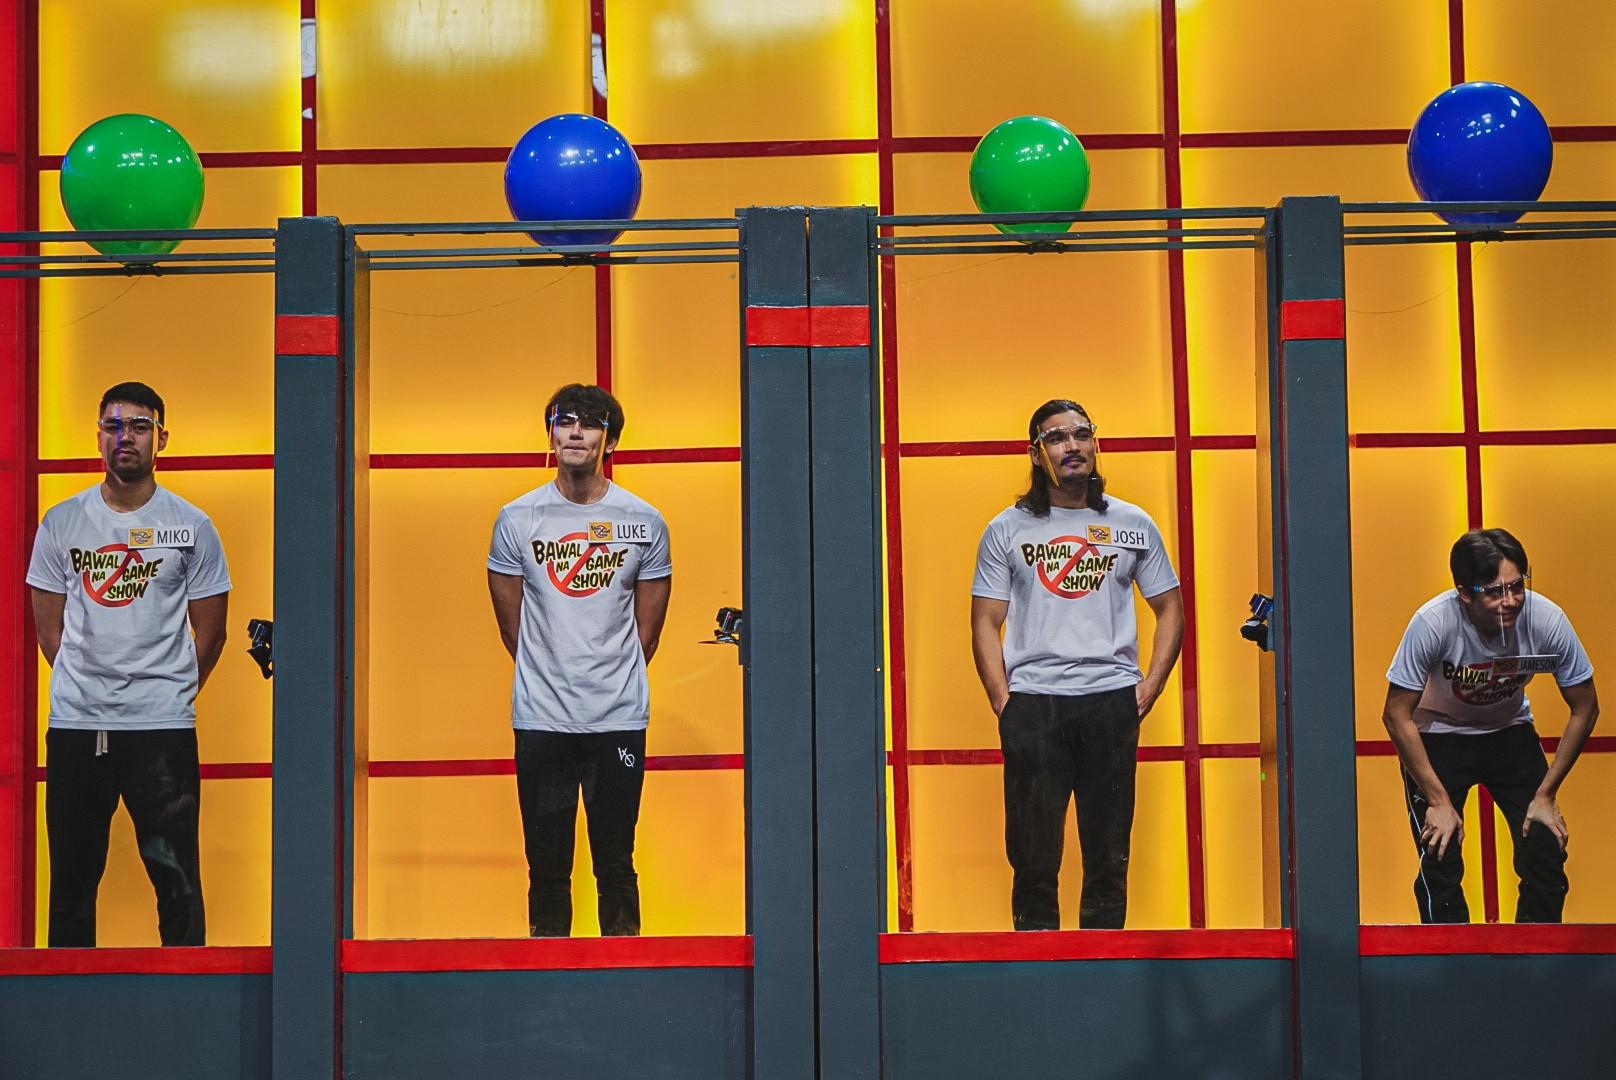 Joshua Colet, Miko Raval, Luke Conde, and Jameson Blake in Bawal na game show (2020)